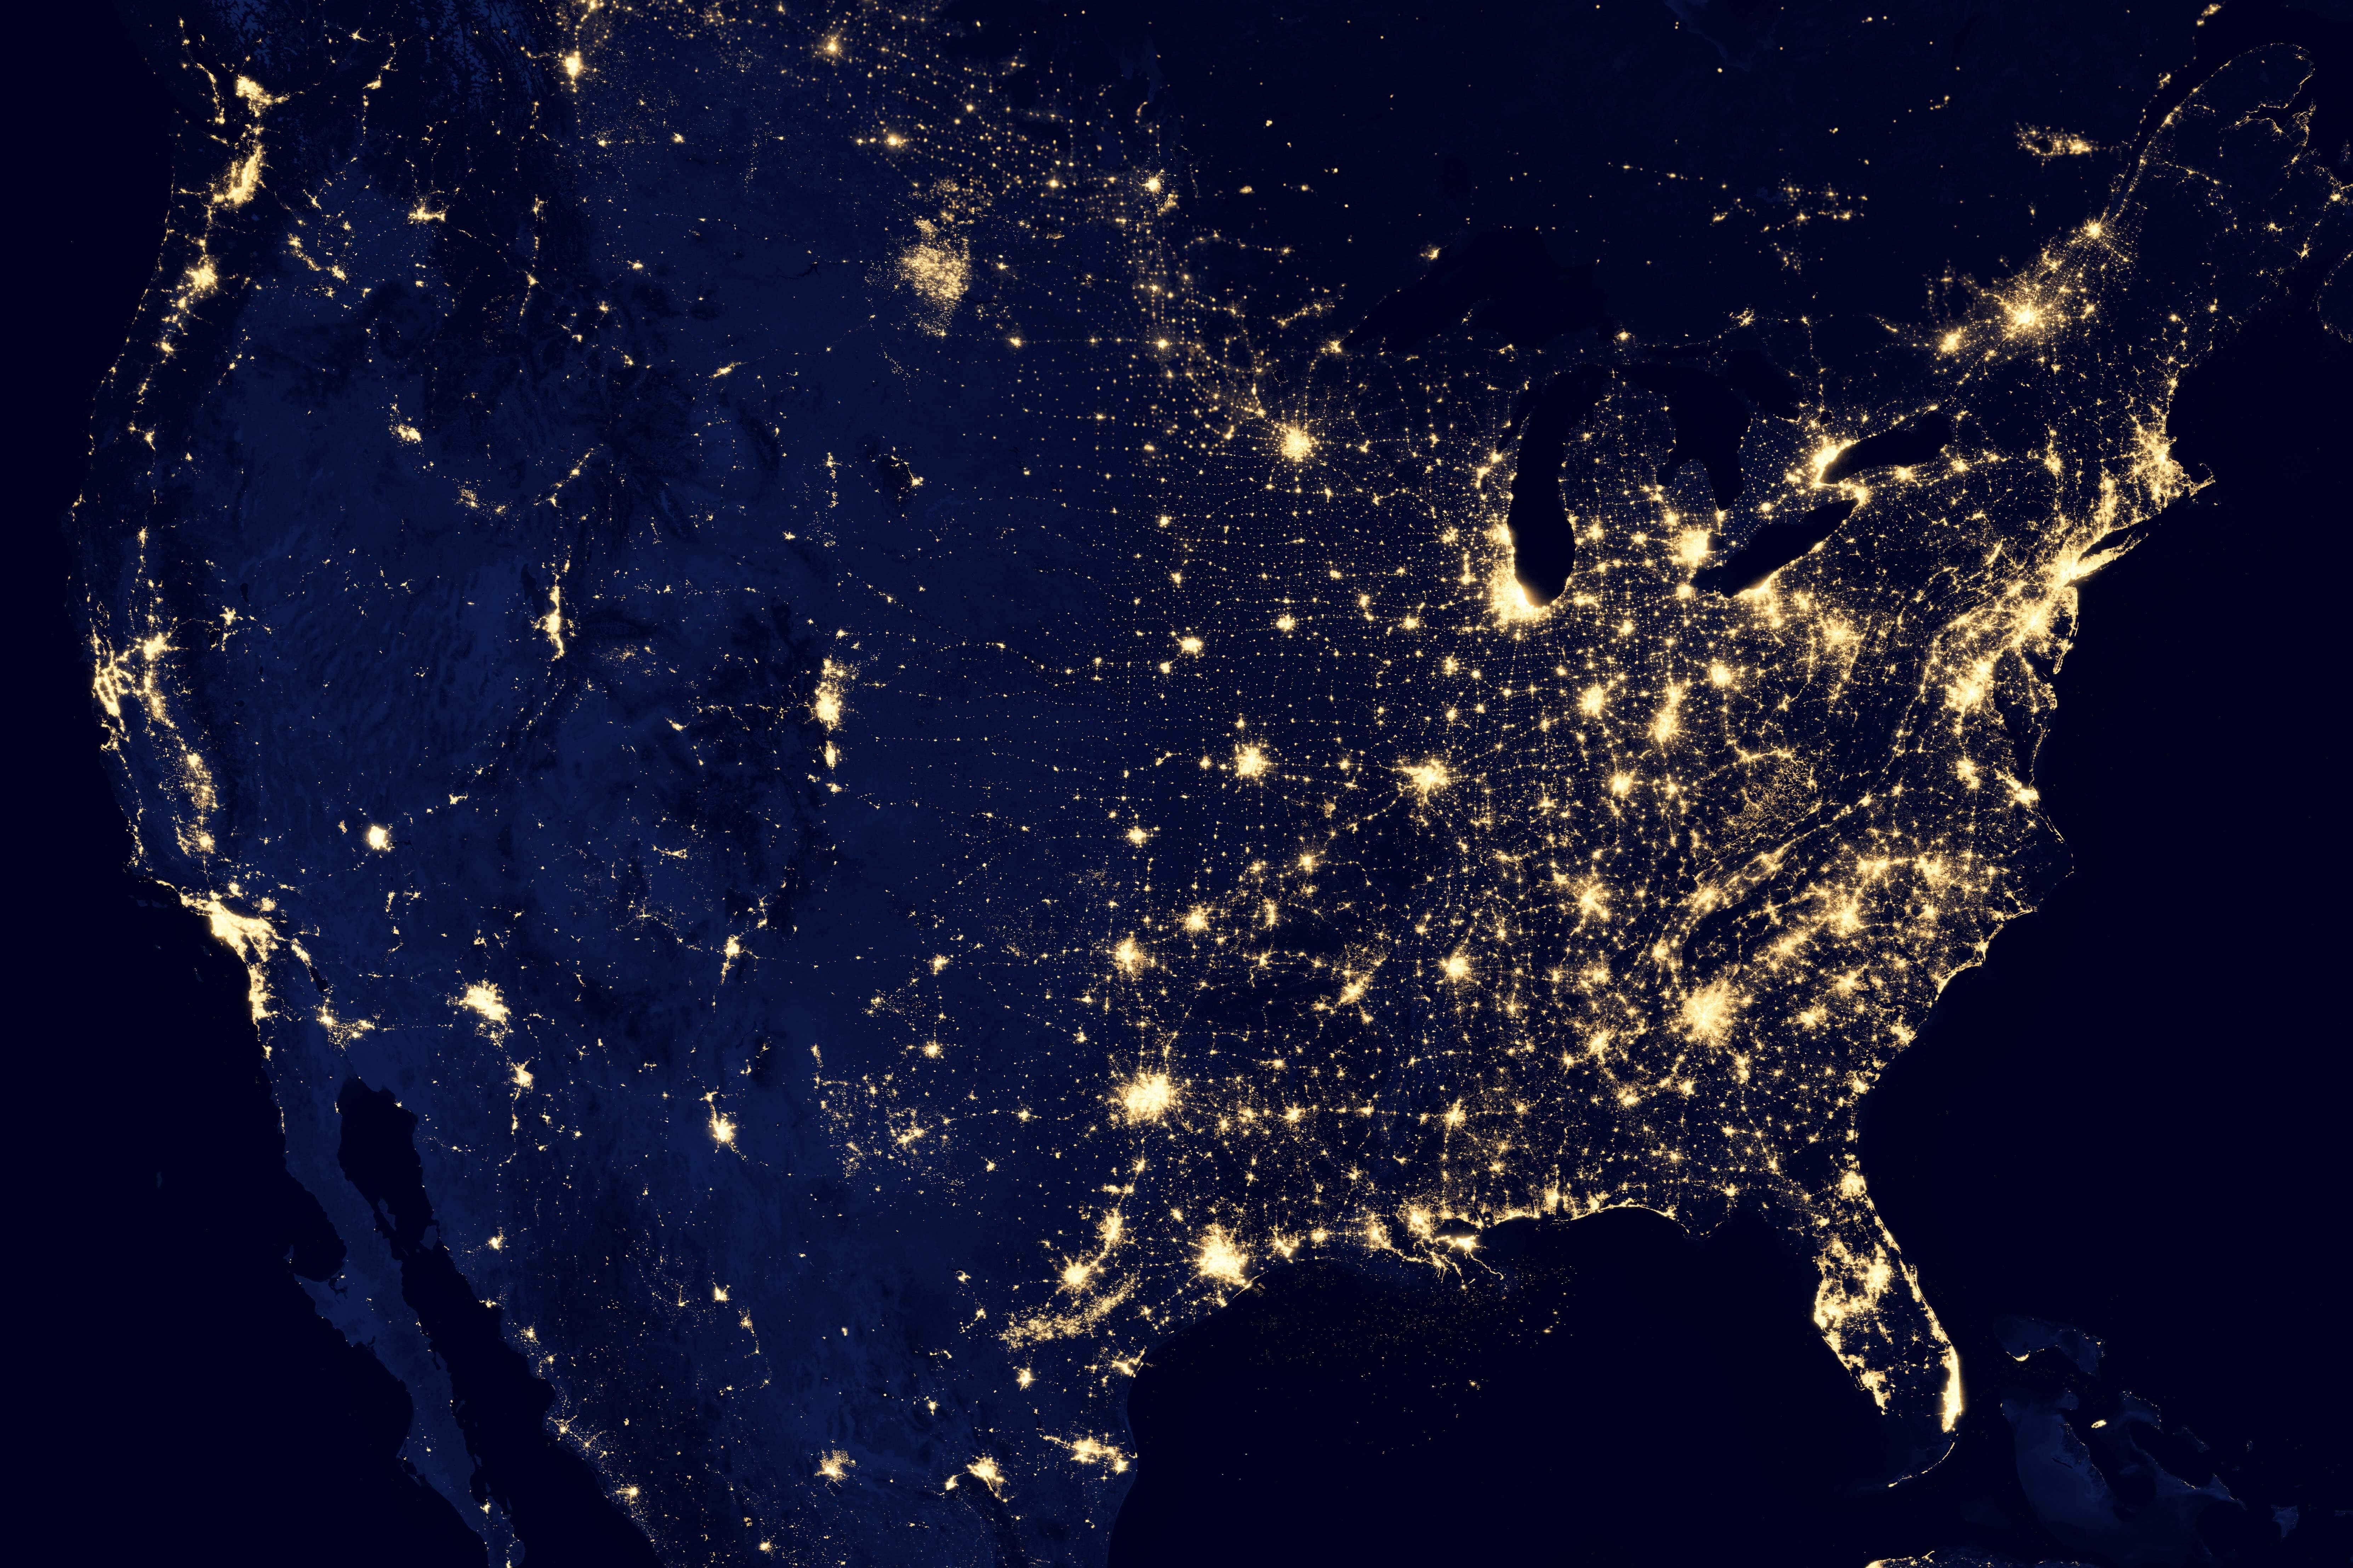 USA light pollution from NASA